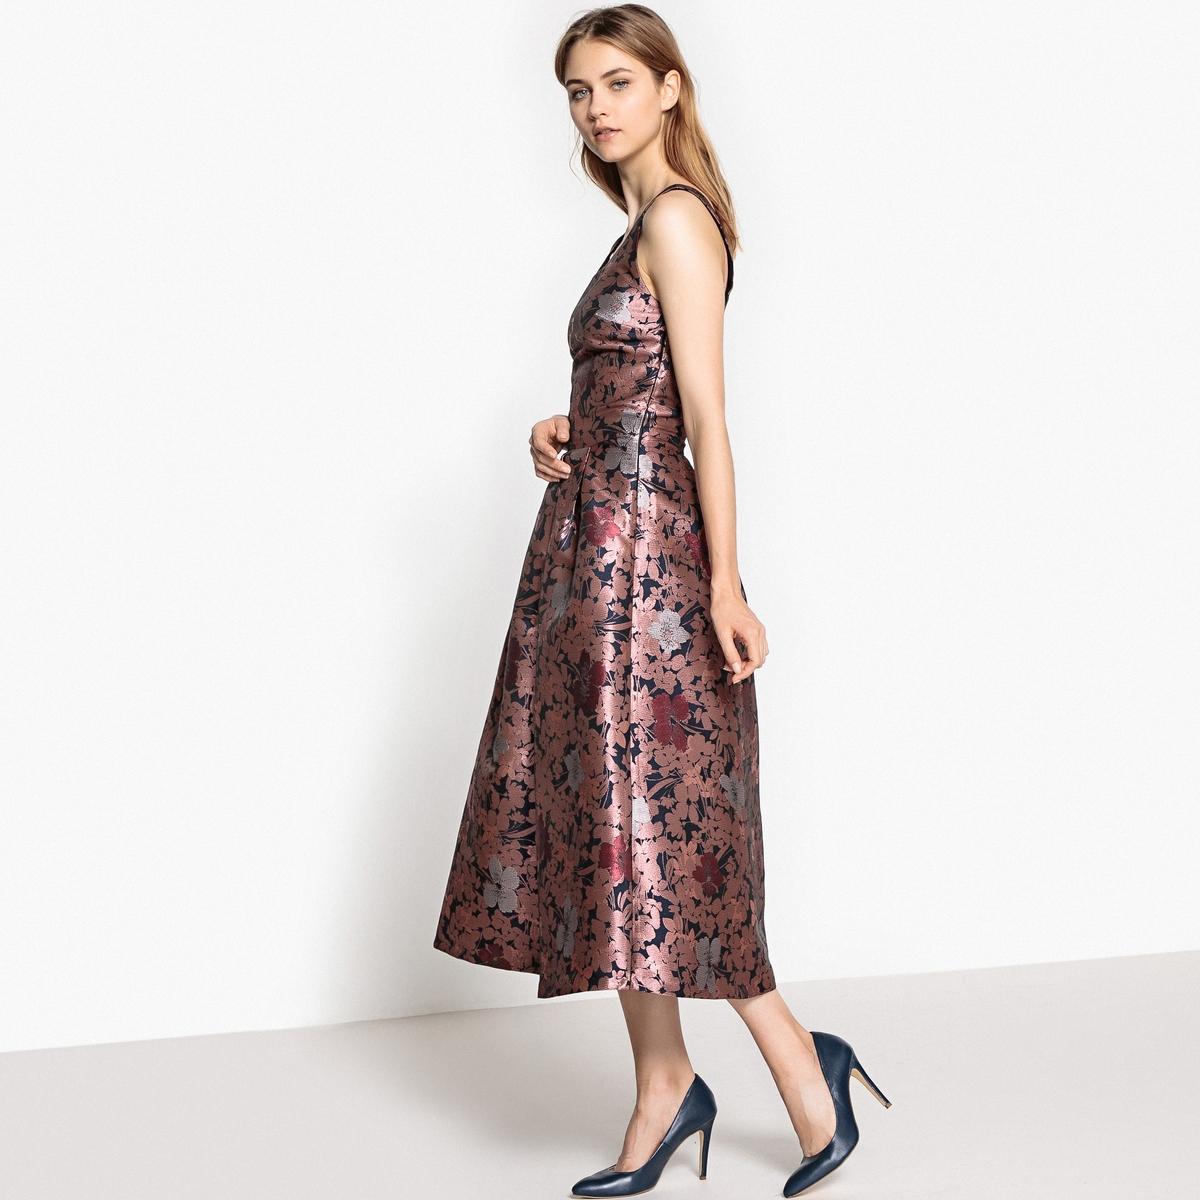 Платье-миди с жаккардовым рисунком кардиган с жаккардовым рисунком от 3 до 12 лет